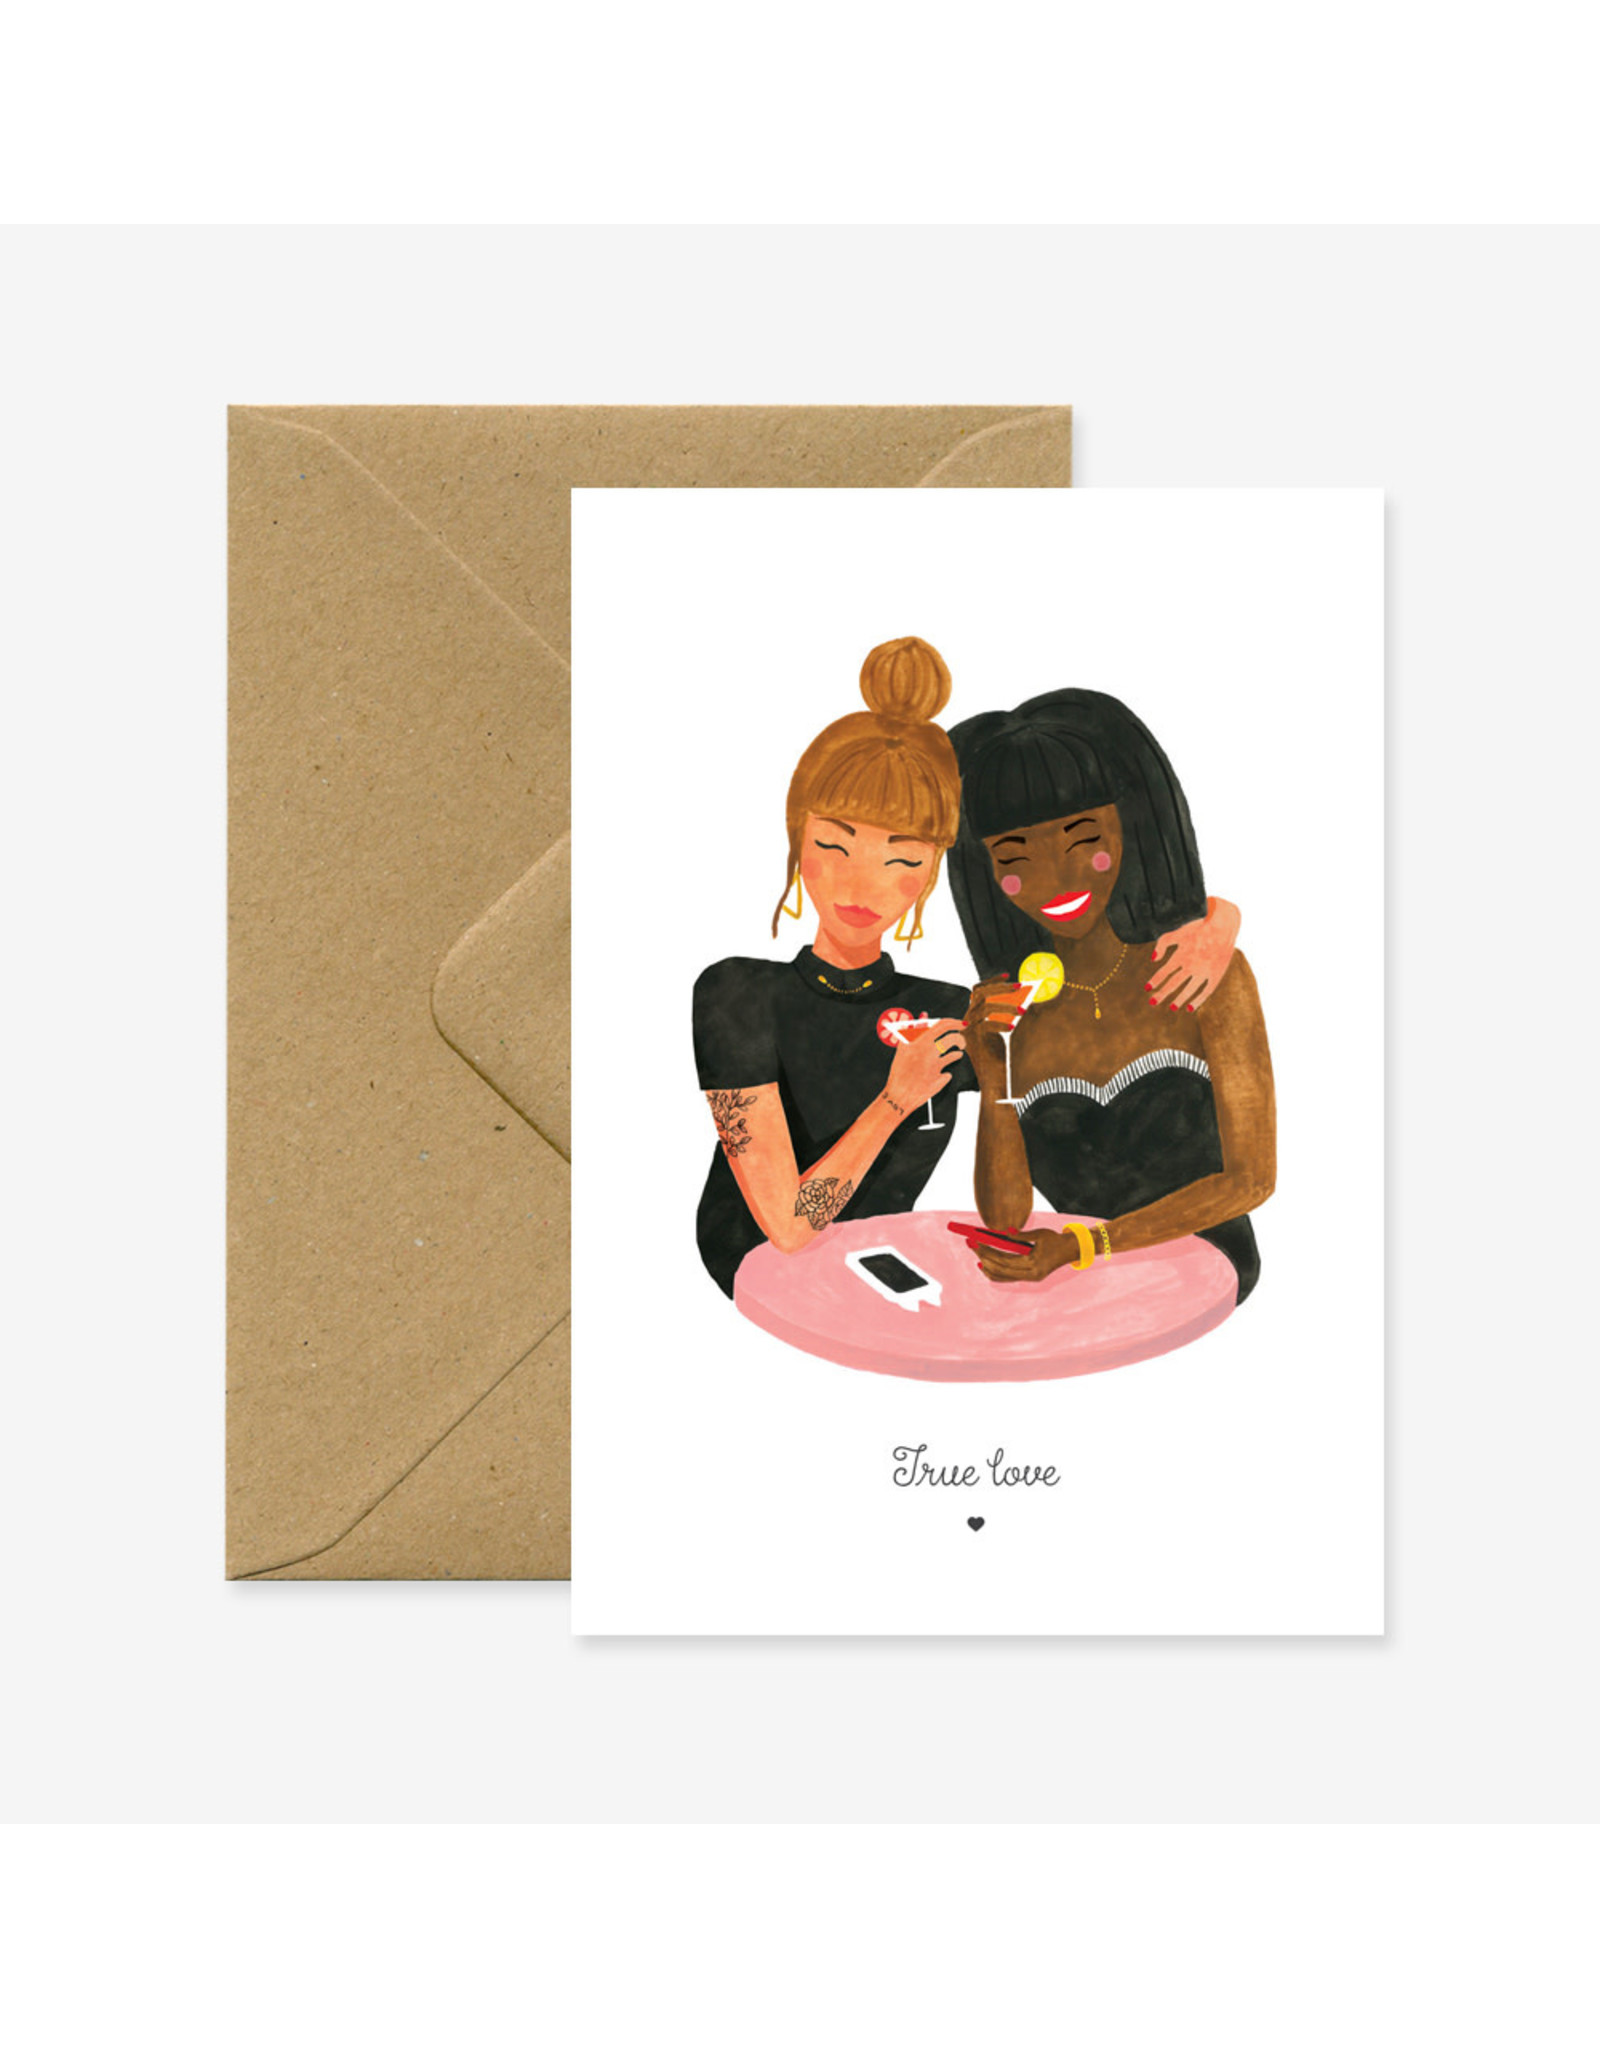 ATWS Wenskaart - True love - Dubbele kaart + Envelop - 11,5 x 16,5 - Blanco